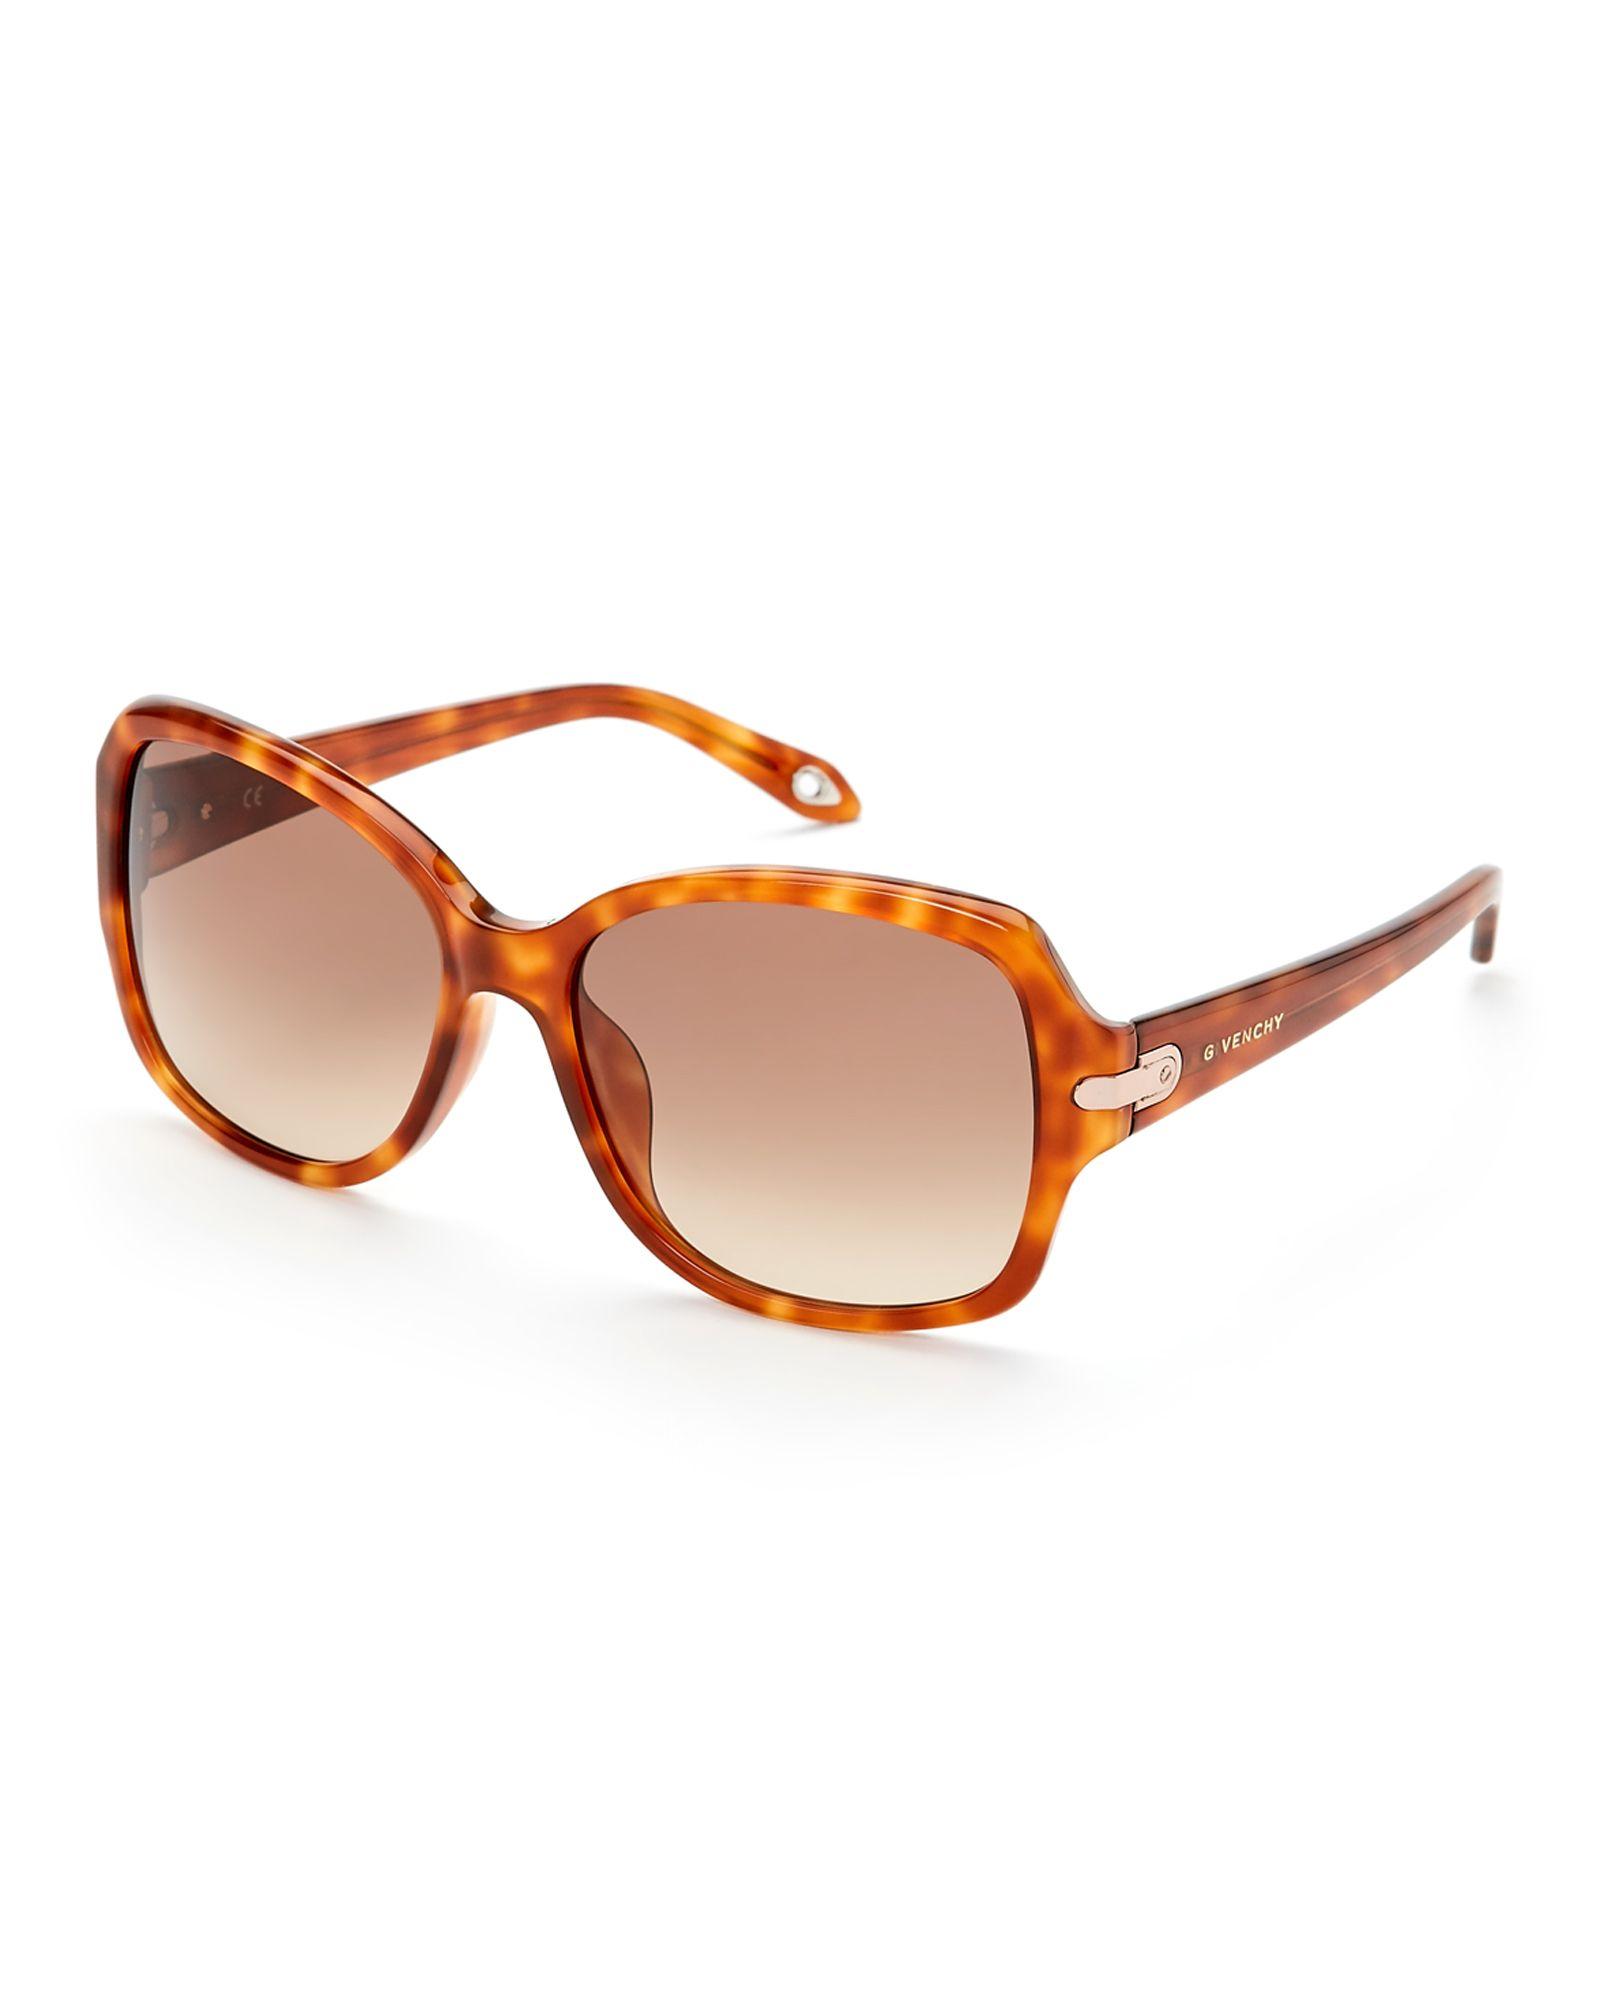 Givenchy Honey Havana SGV897 XL Square Sunglasses